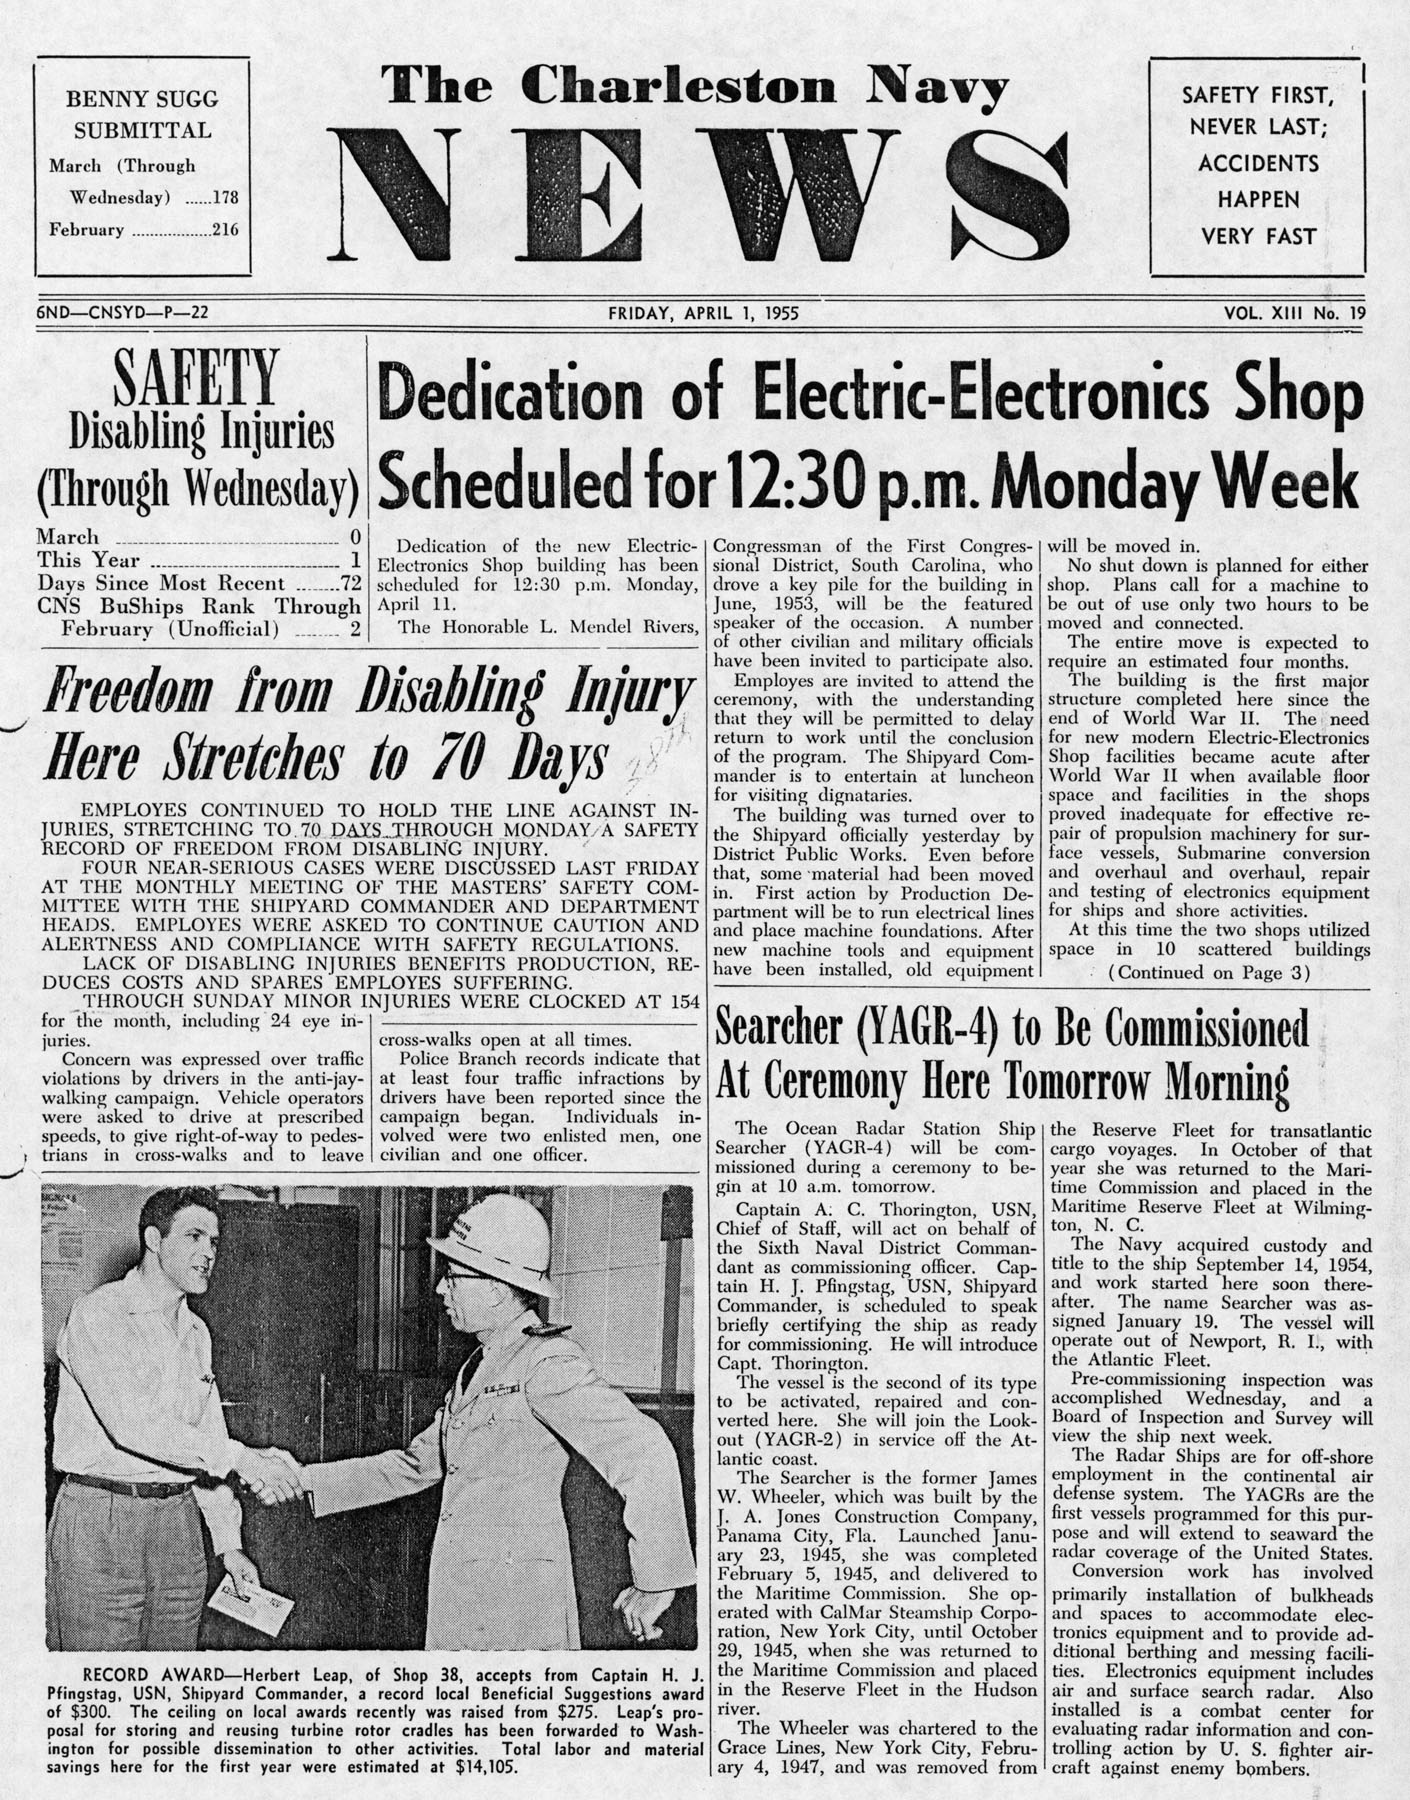 The Charleston Navy News, Volume 13, Edition 19, page i